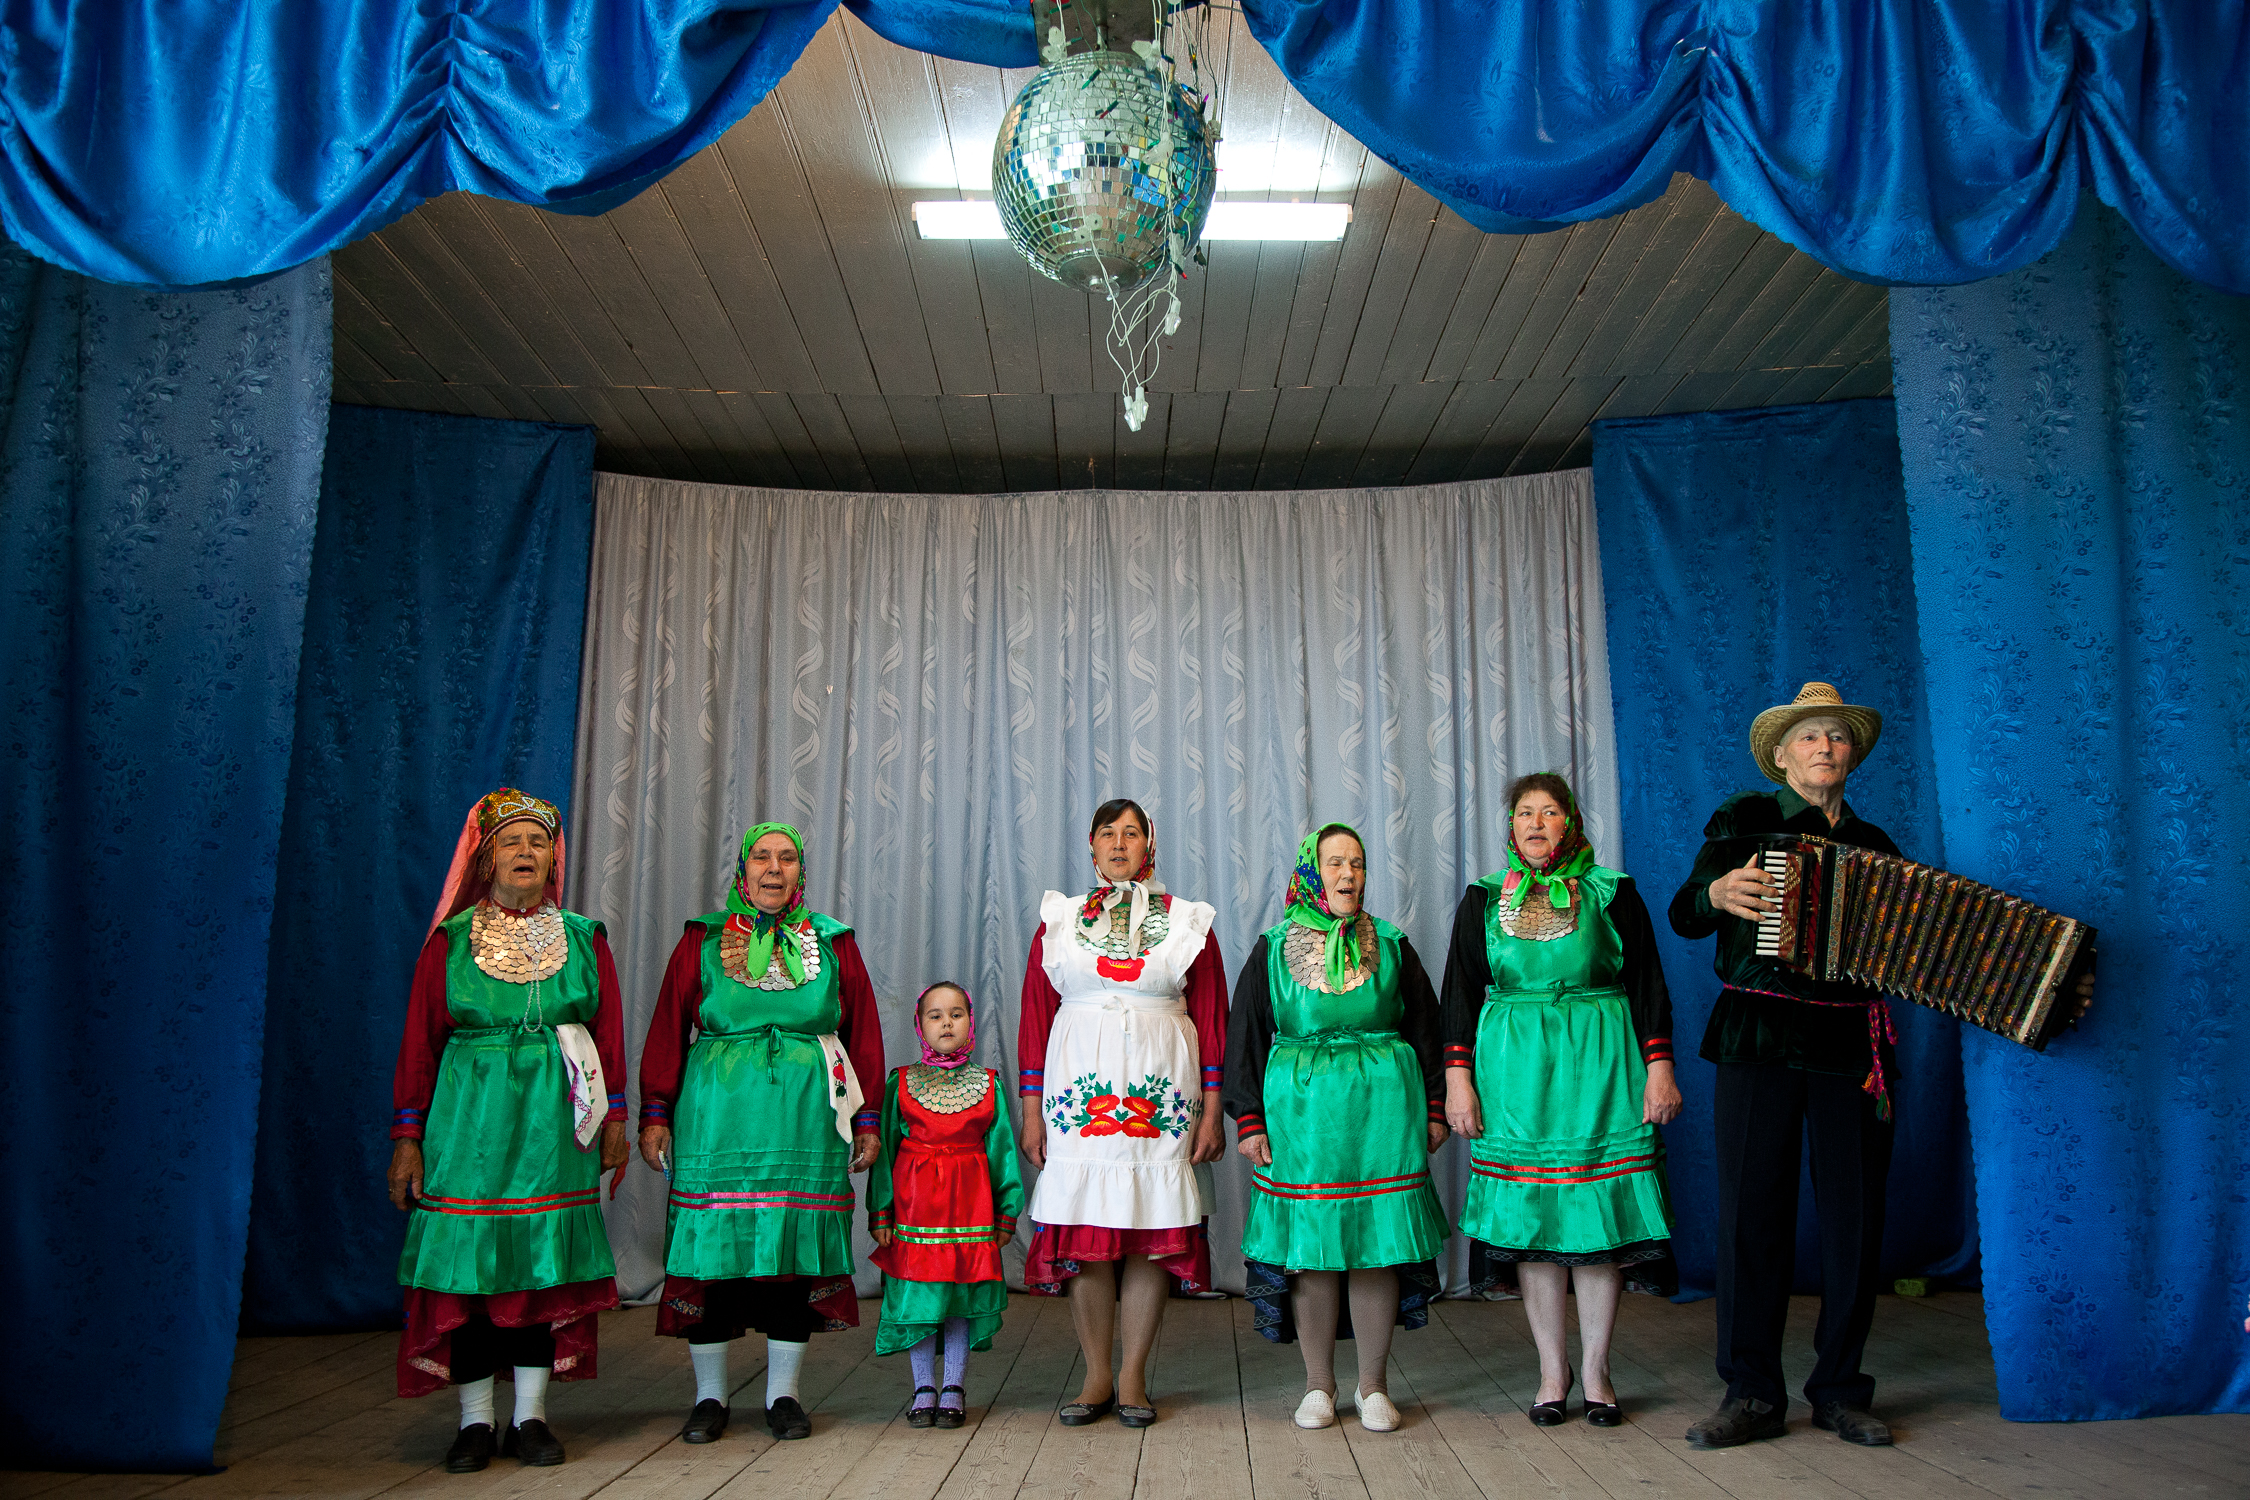 Kazan_140525_22159